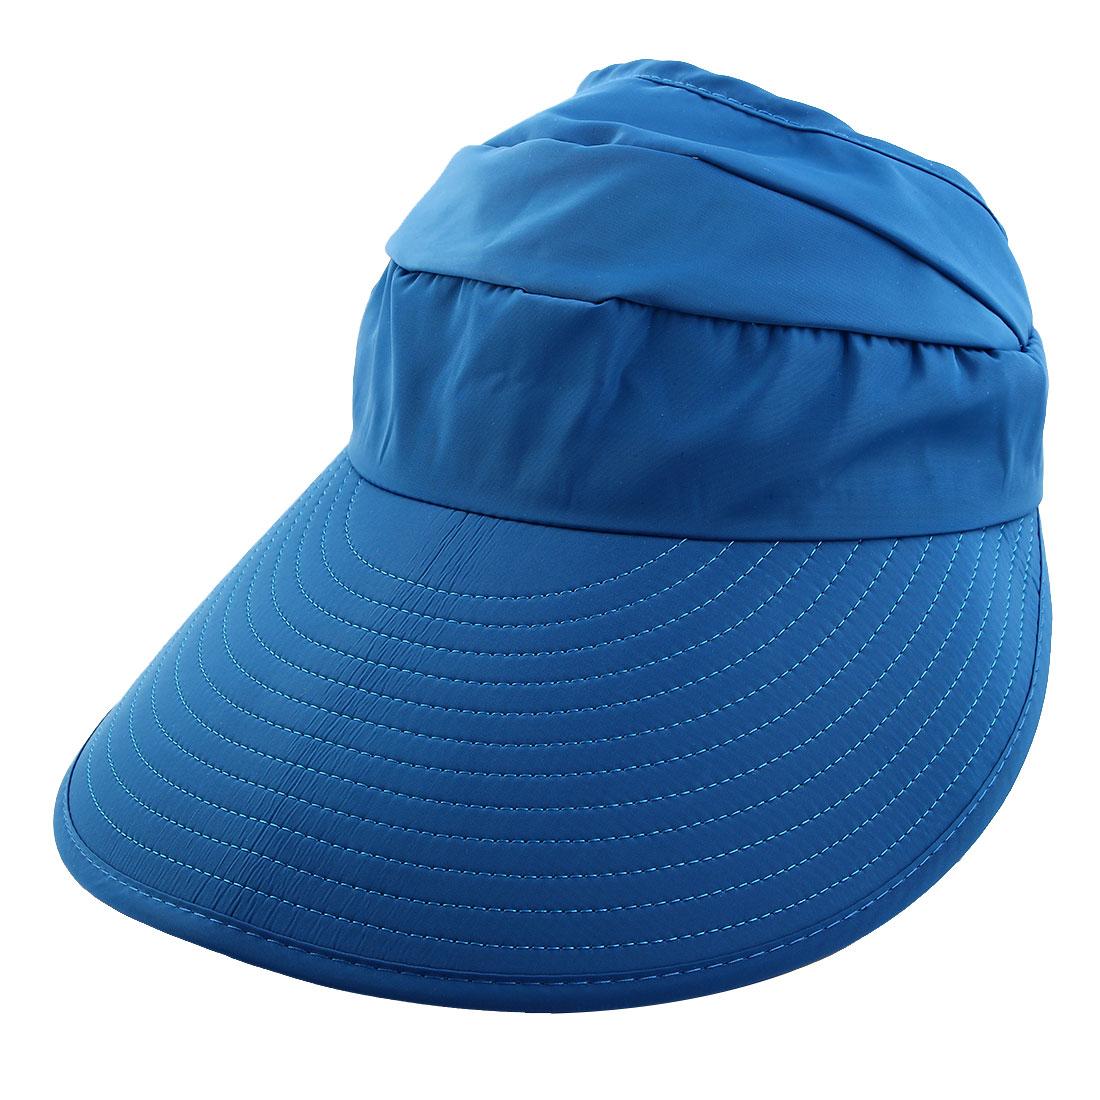 Lady Polyester Leaf Printed Summer Travel Holiday Beach Floppy Cap Sun Visor Hat Blue